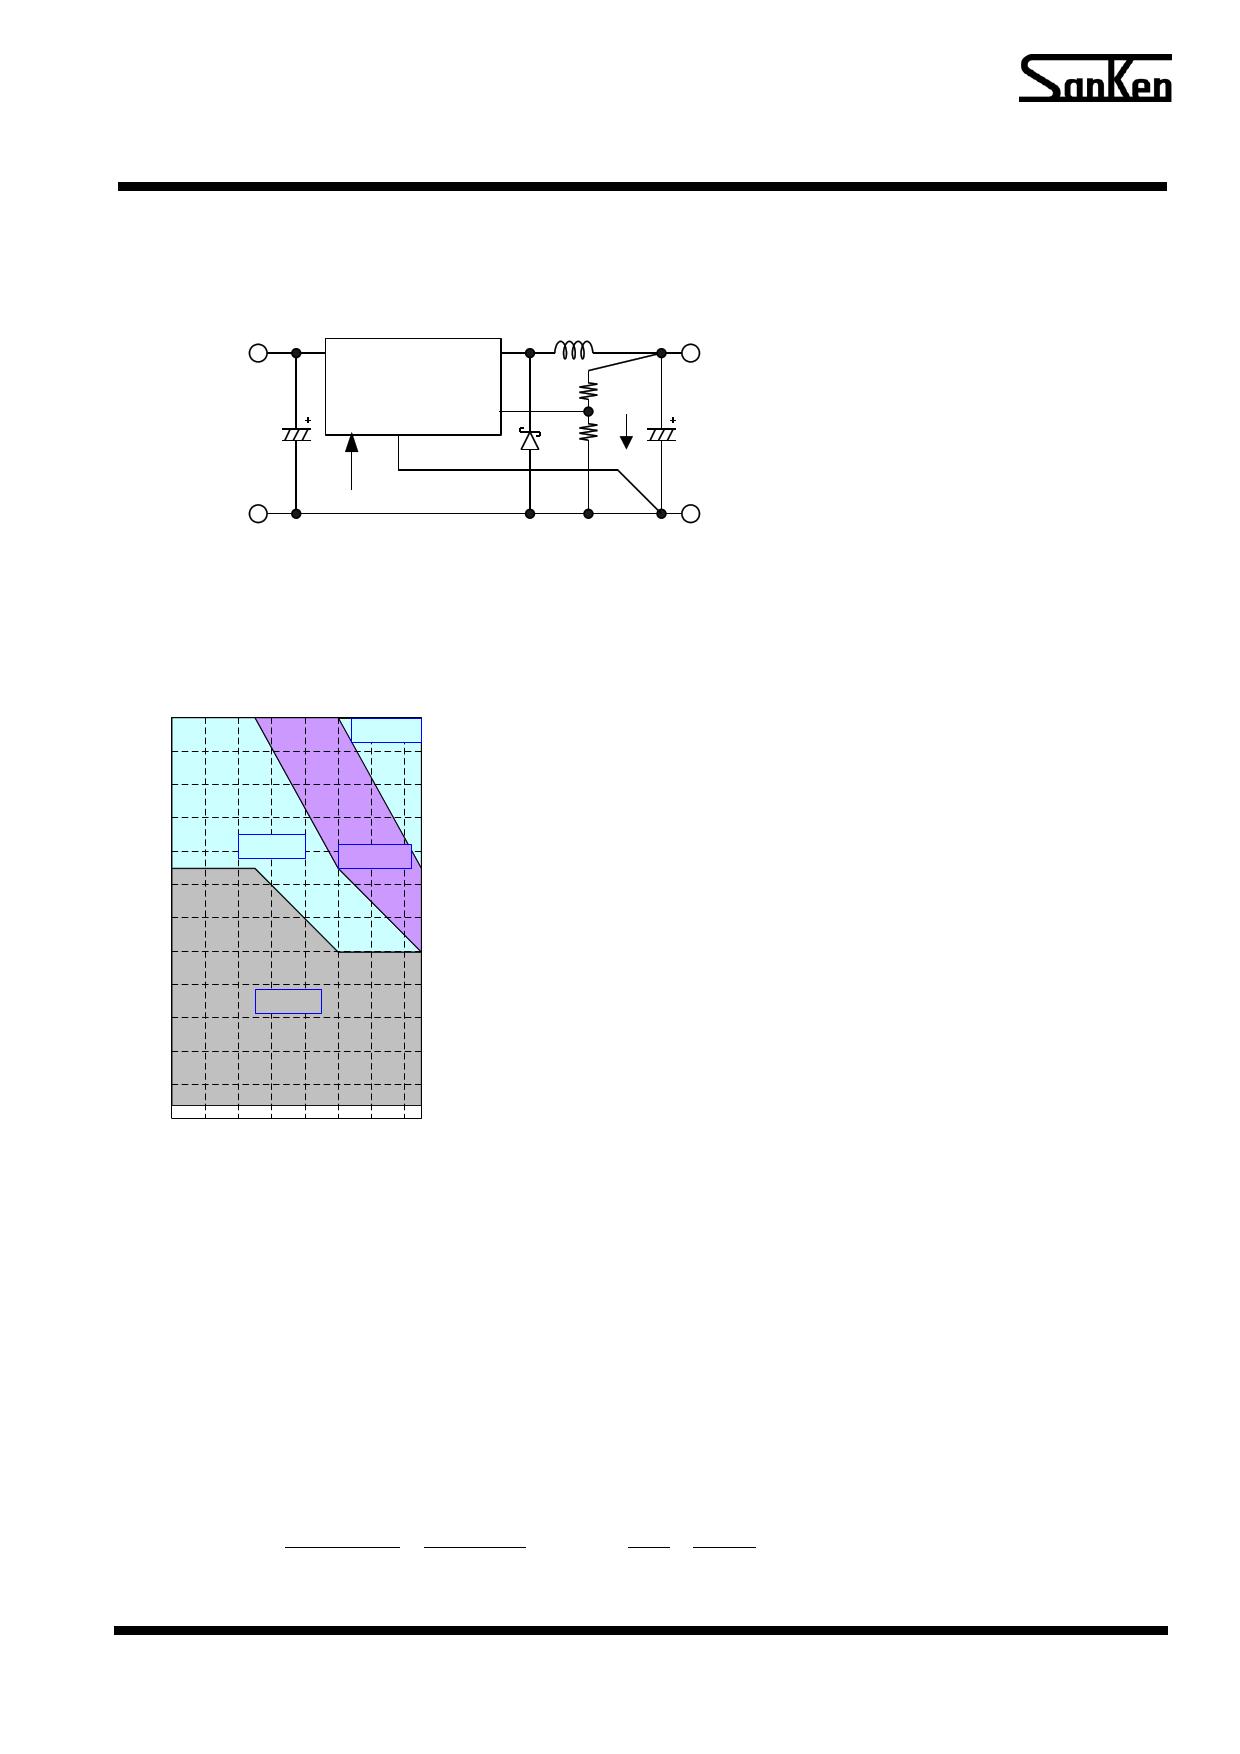 si-8008tmx datasheet pdf   pinout